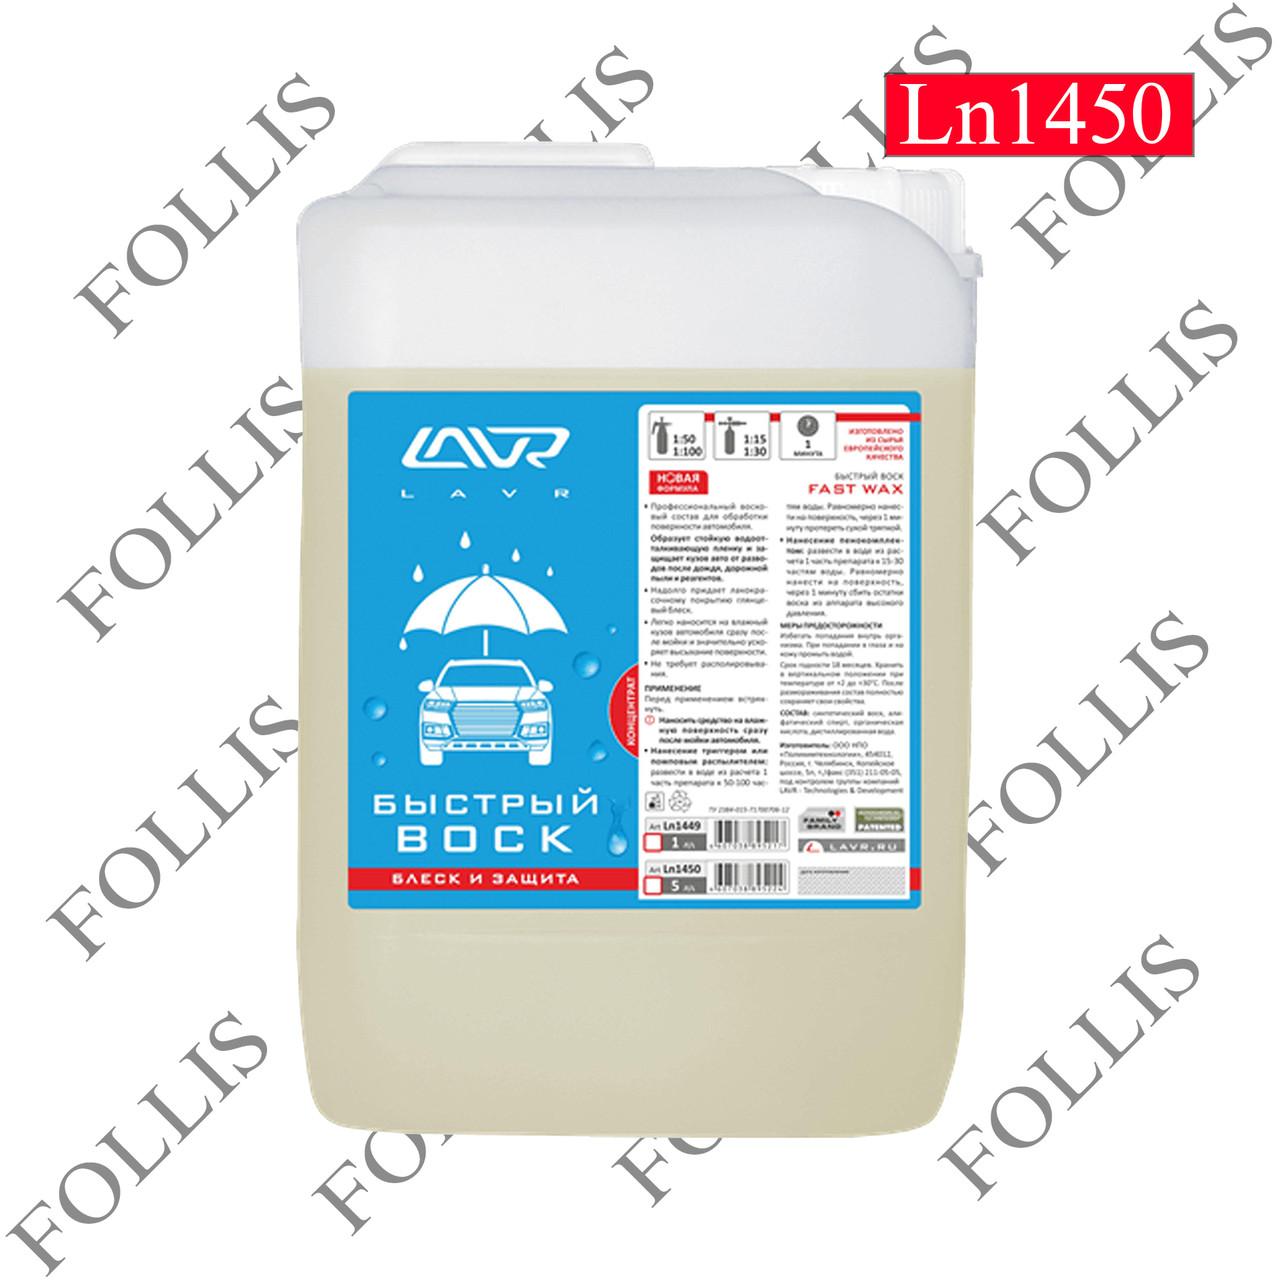 Быстрый воск (концентрат 1:50 - 1:100) LAVR Fast Wax 5л